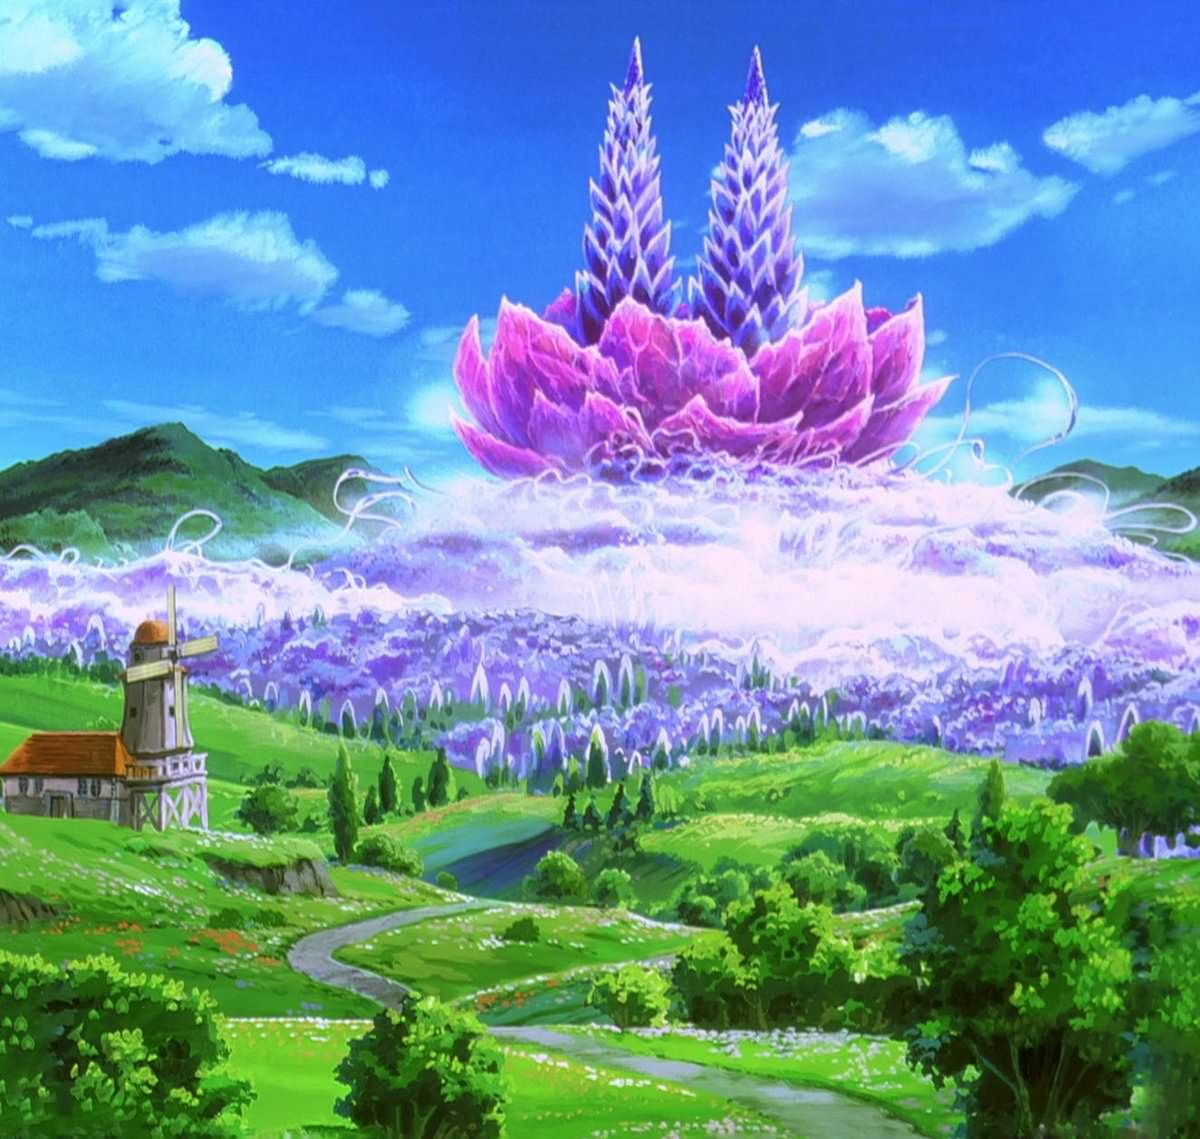 Pokemon 3 The Movie 2000 Pokemon Backgrounds Anime Background Pokemon Movies